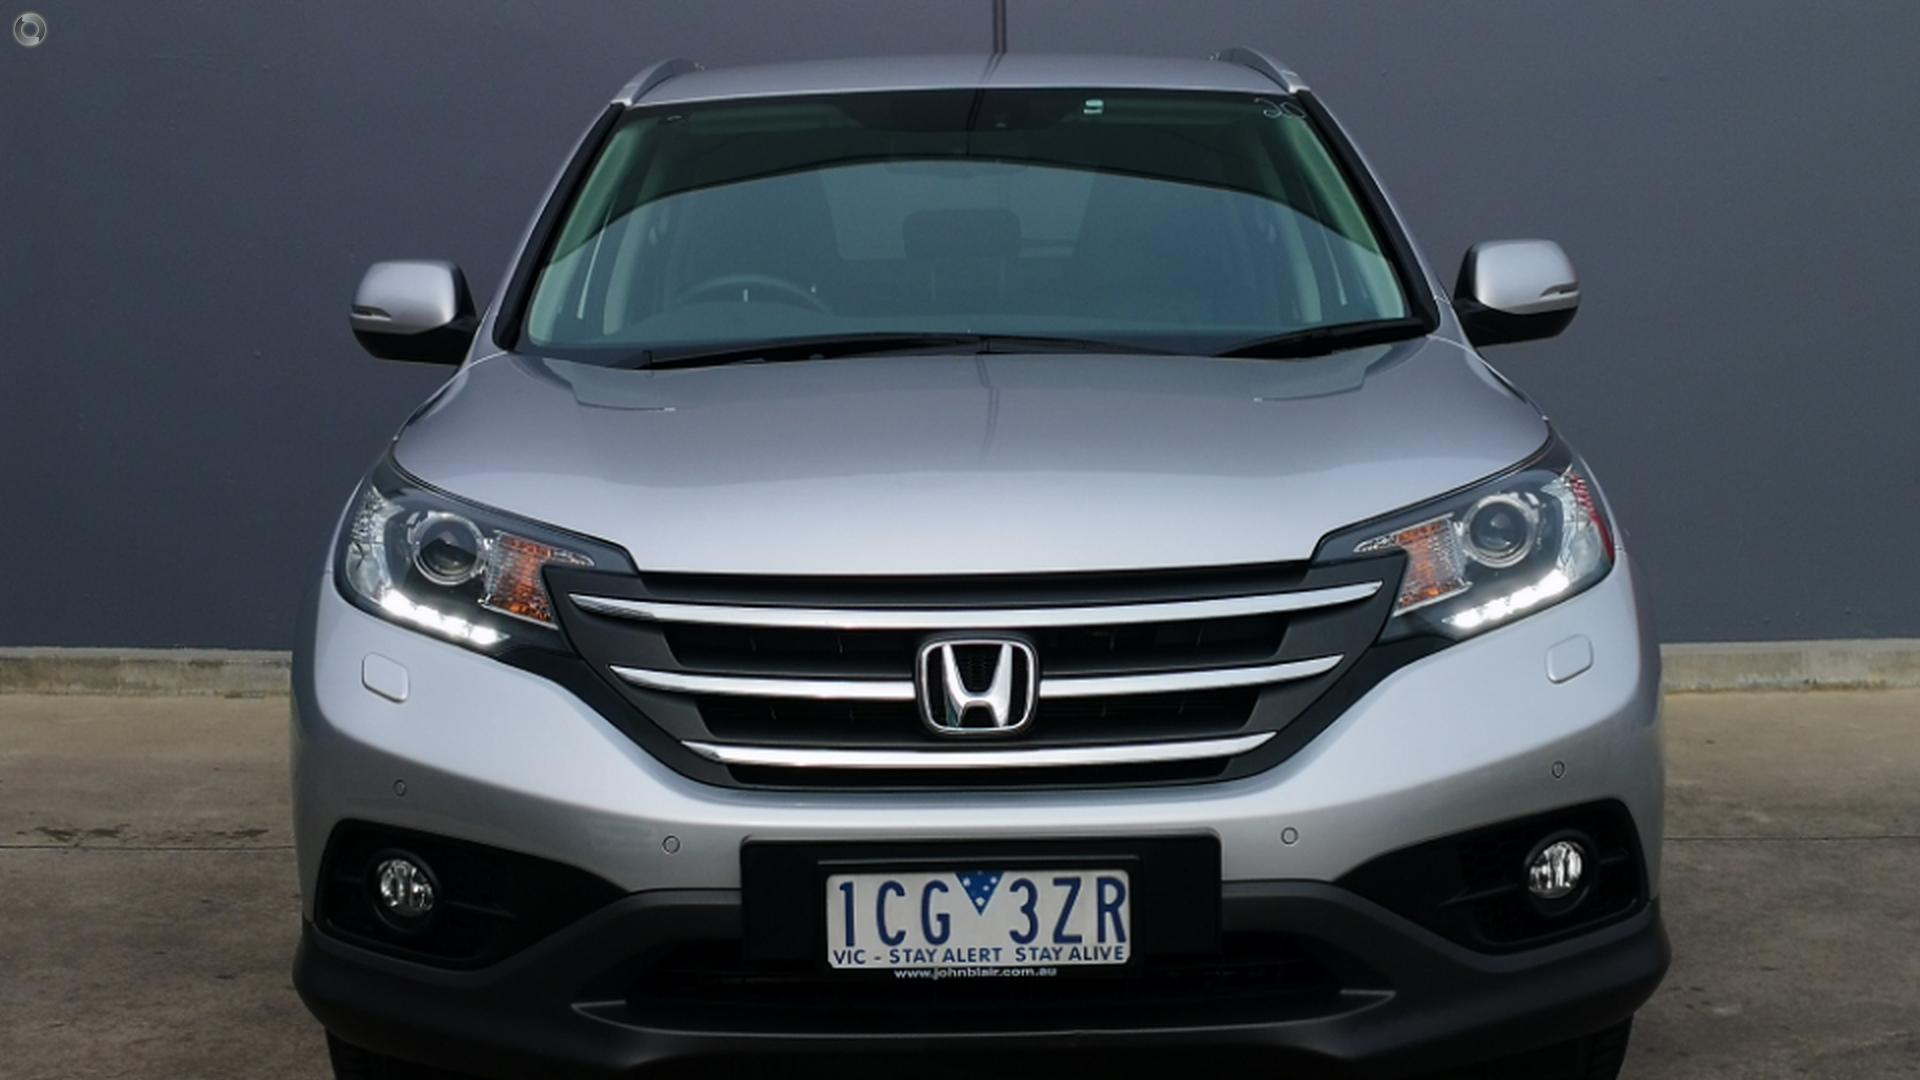 2014 Honda Cr-v DTi-L RM